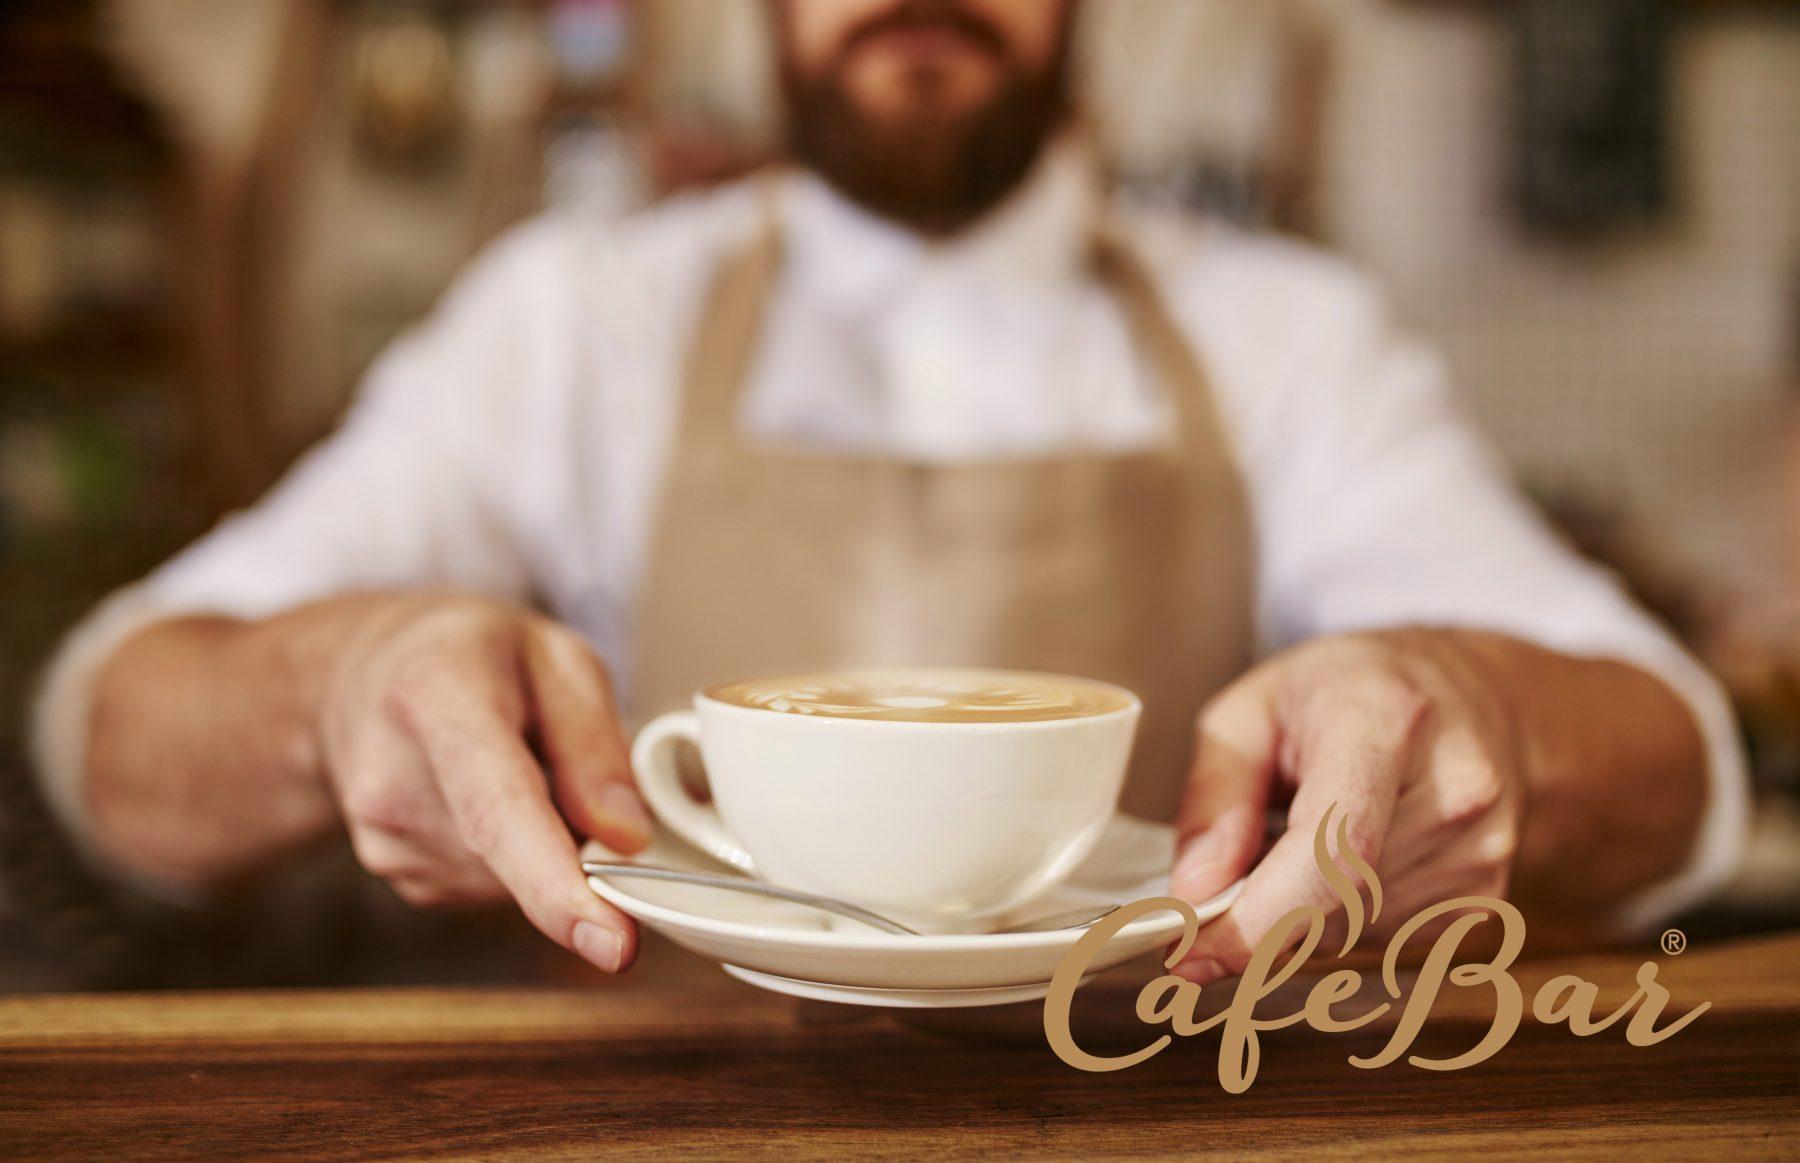 Café Bar gillar bandy!